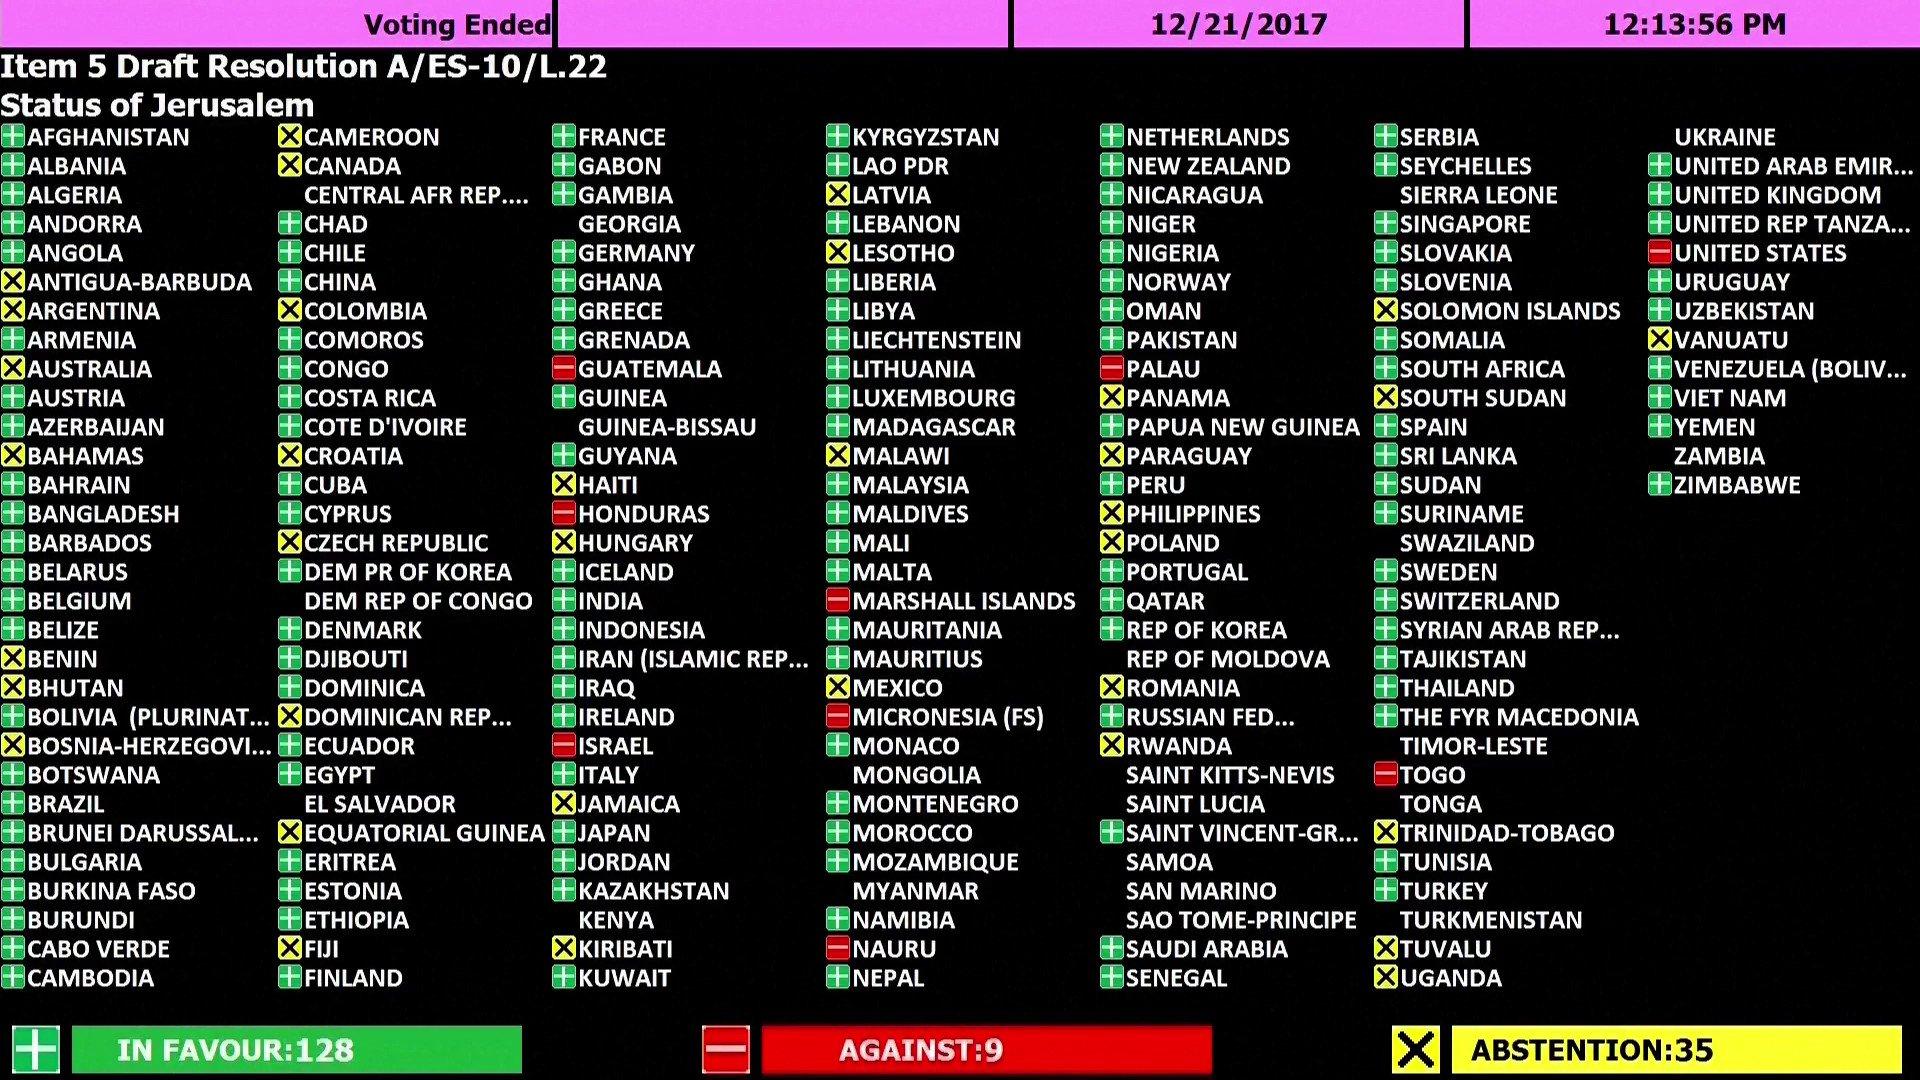 U.N. Votes Overwhelmingly To Condemn U.S. Decision On Jerusalem